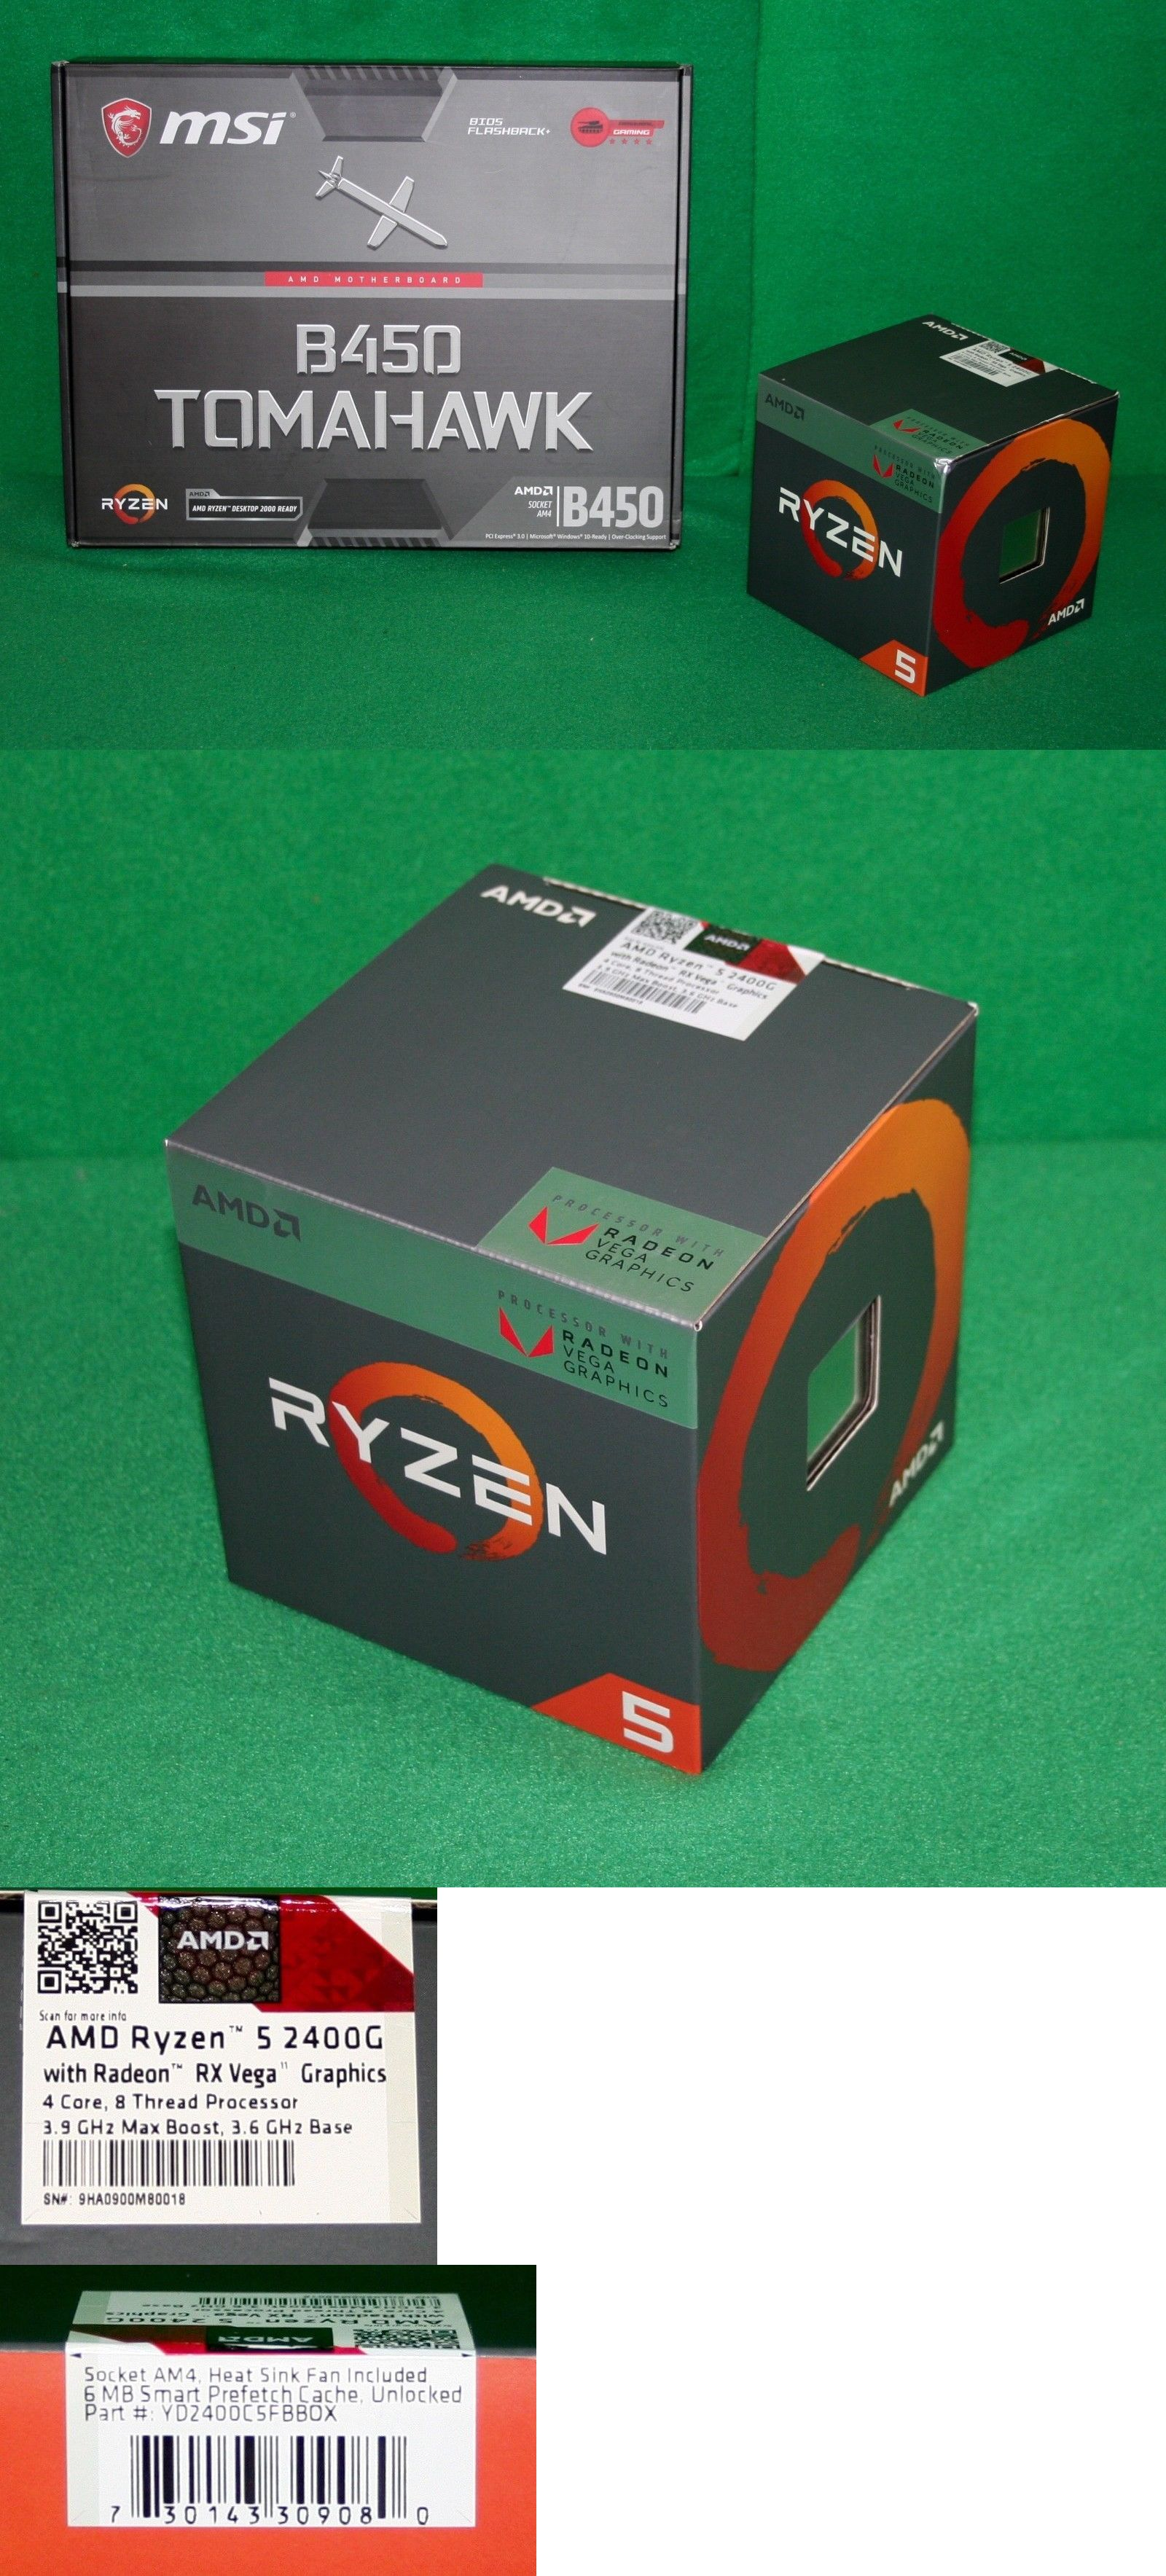 Motherboard and CPU Combos 131511: Amd Ryzen 5 2400G Rx Vega